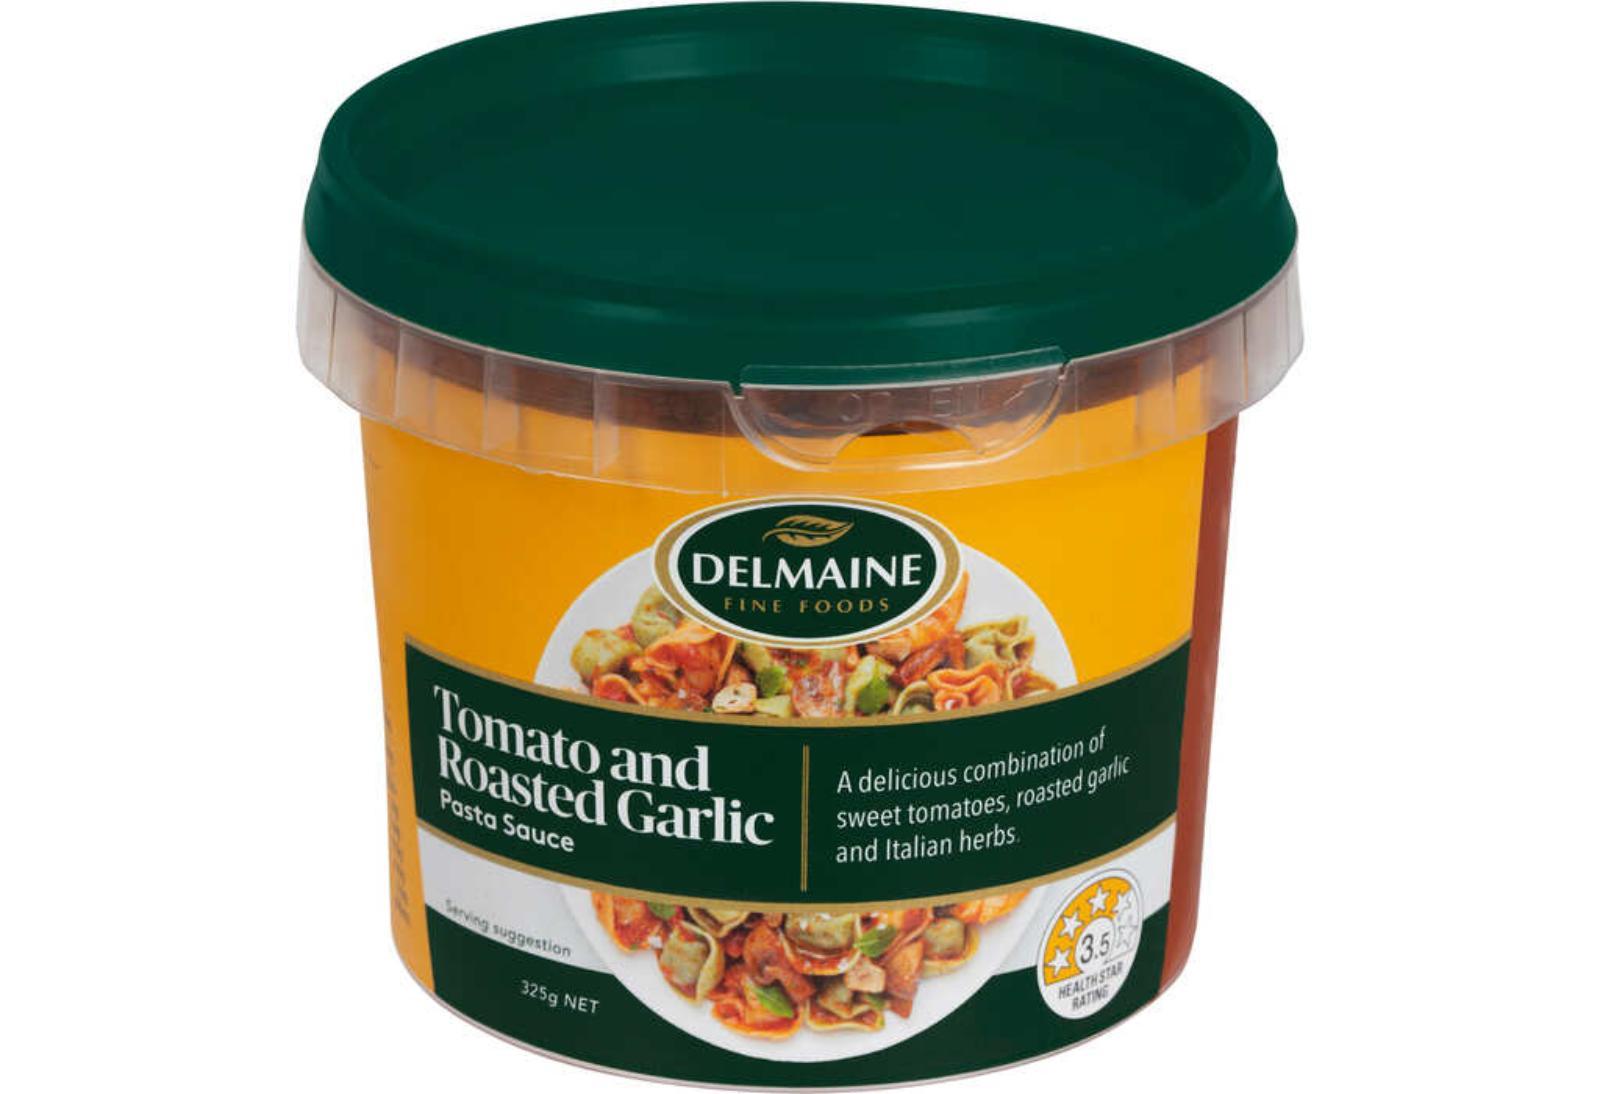 Delmaine Tomato And Roasted Garlic Fresh Pasta Sauce